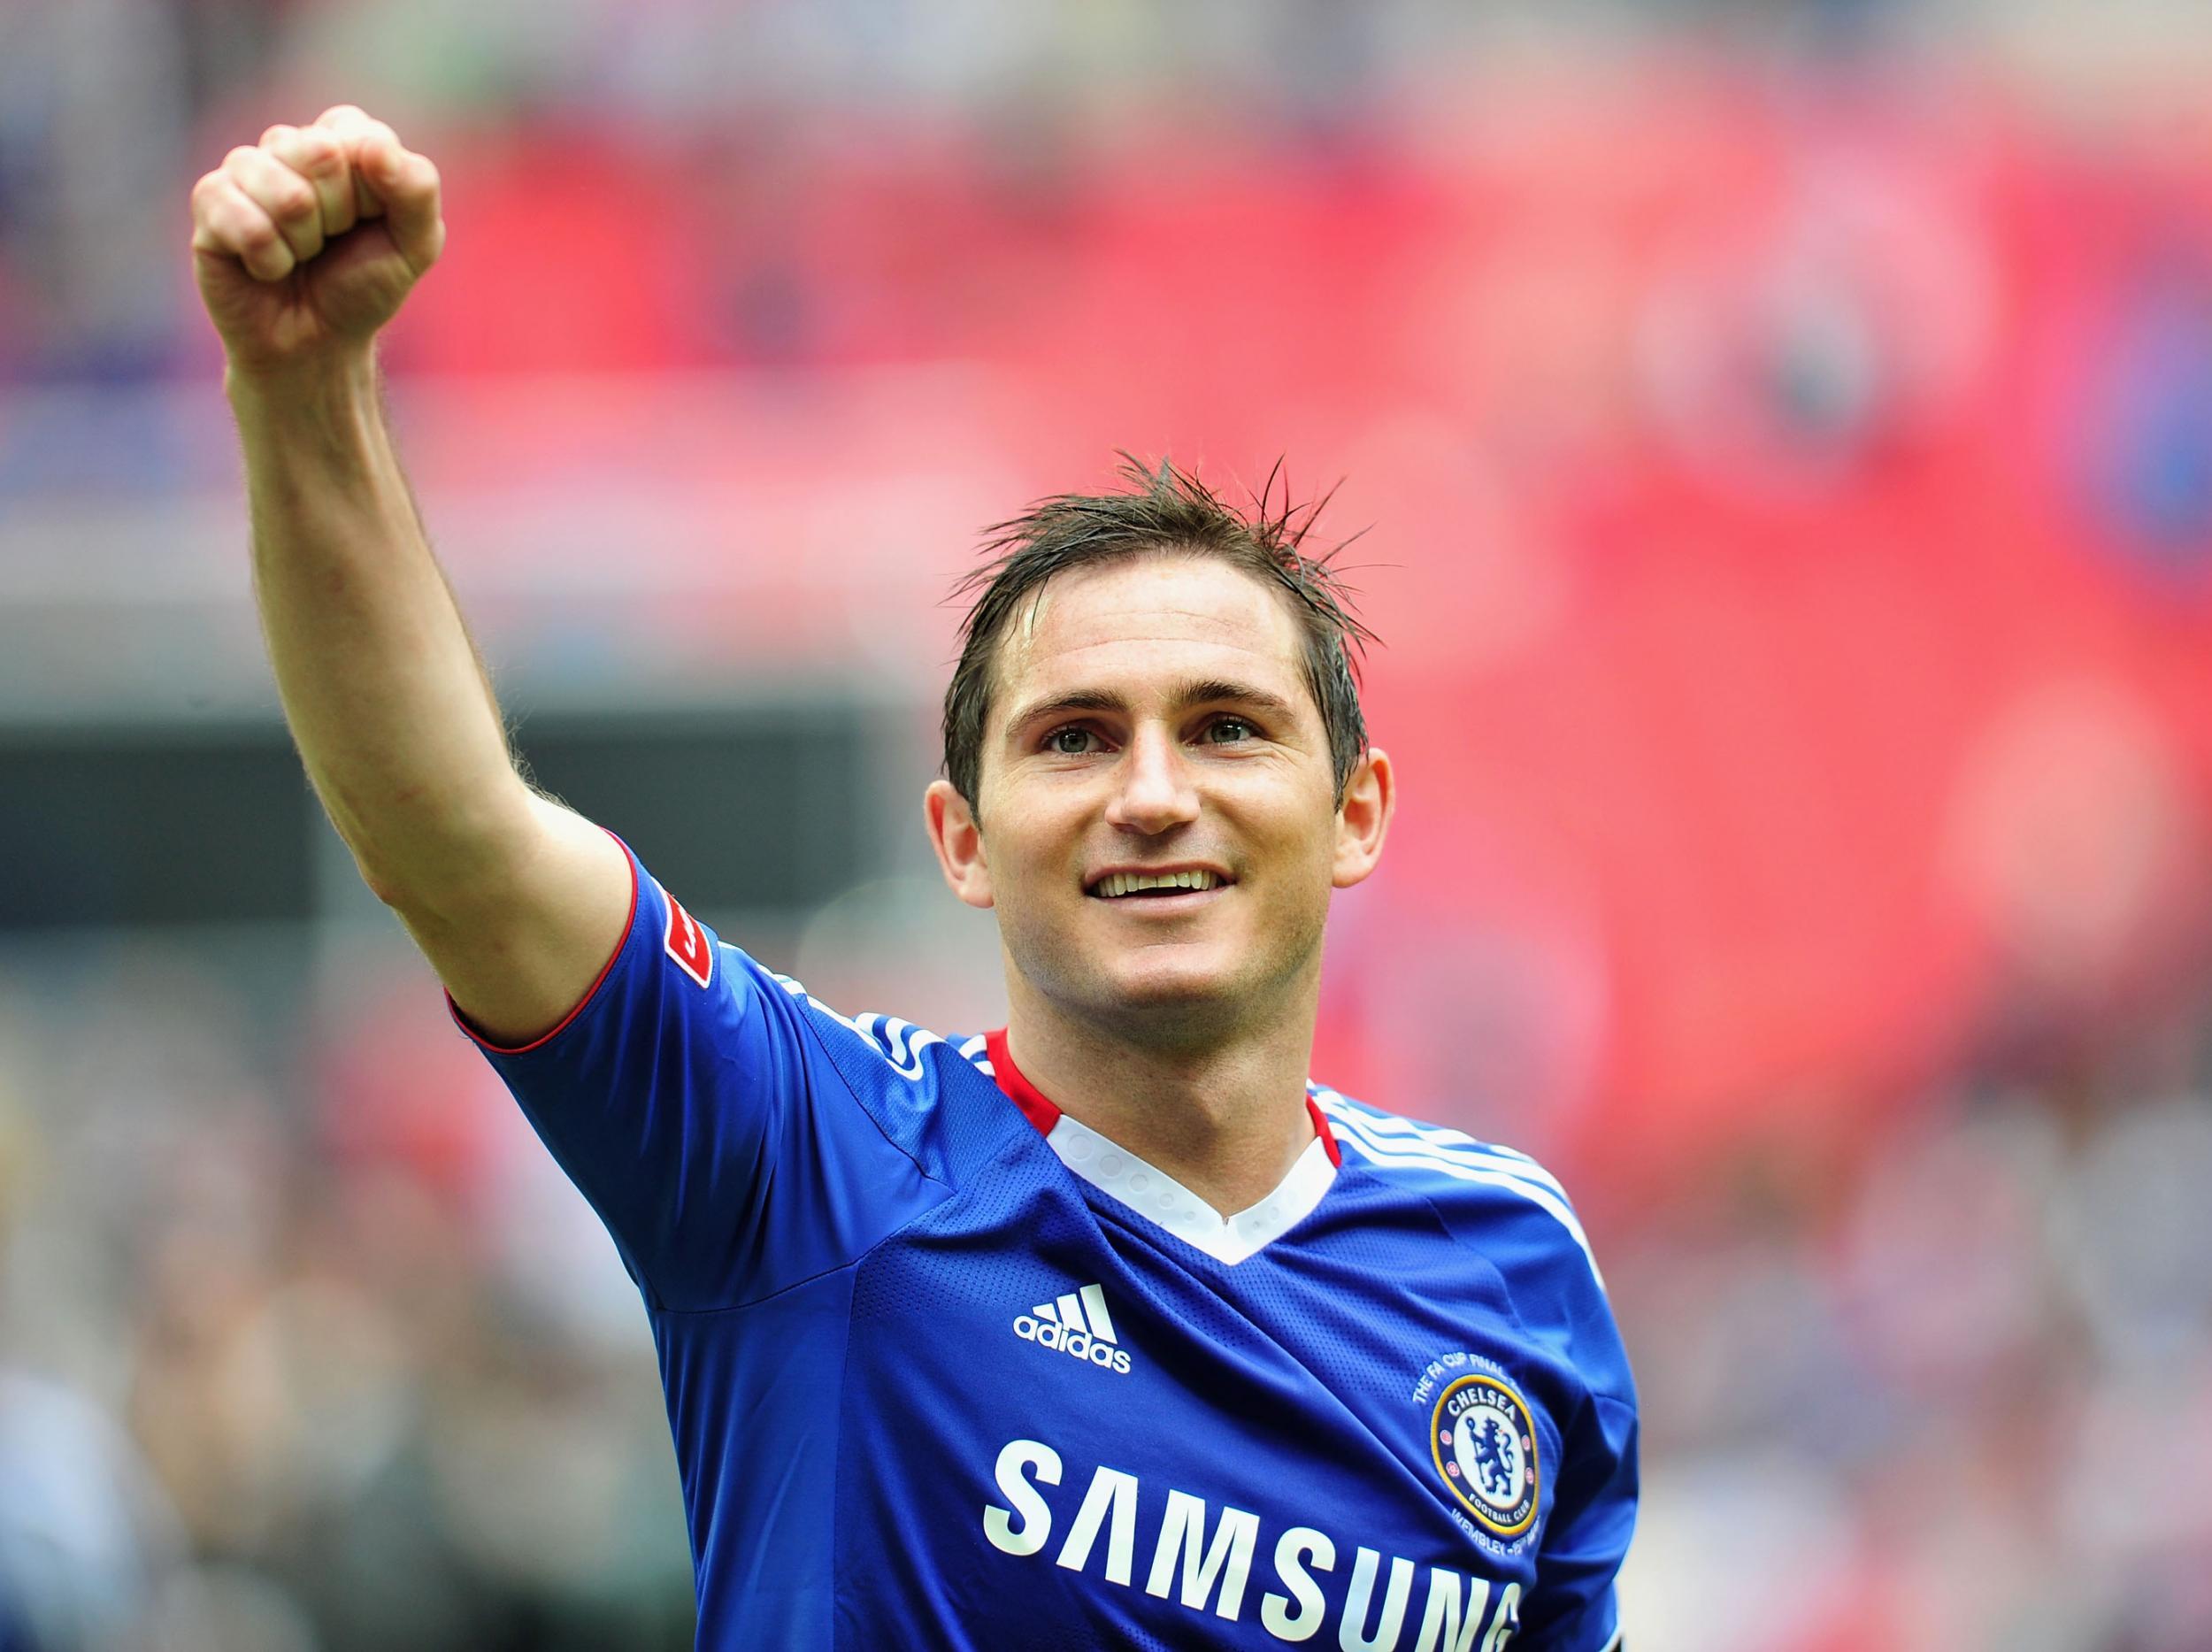 23. Frank Lampard